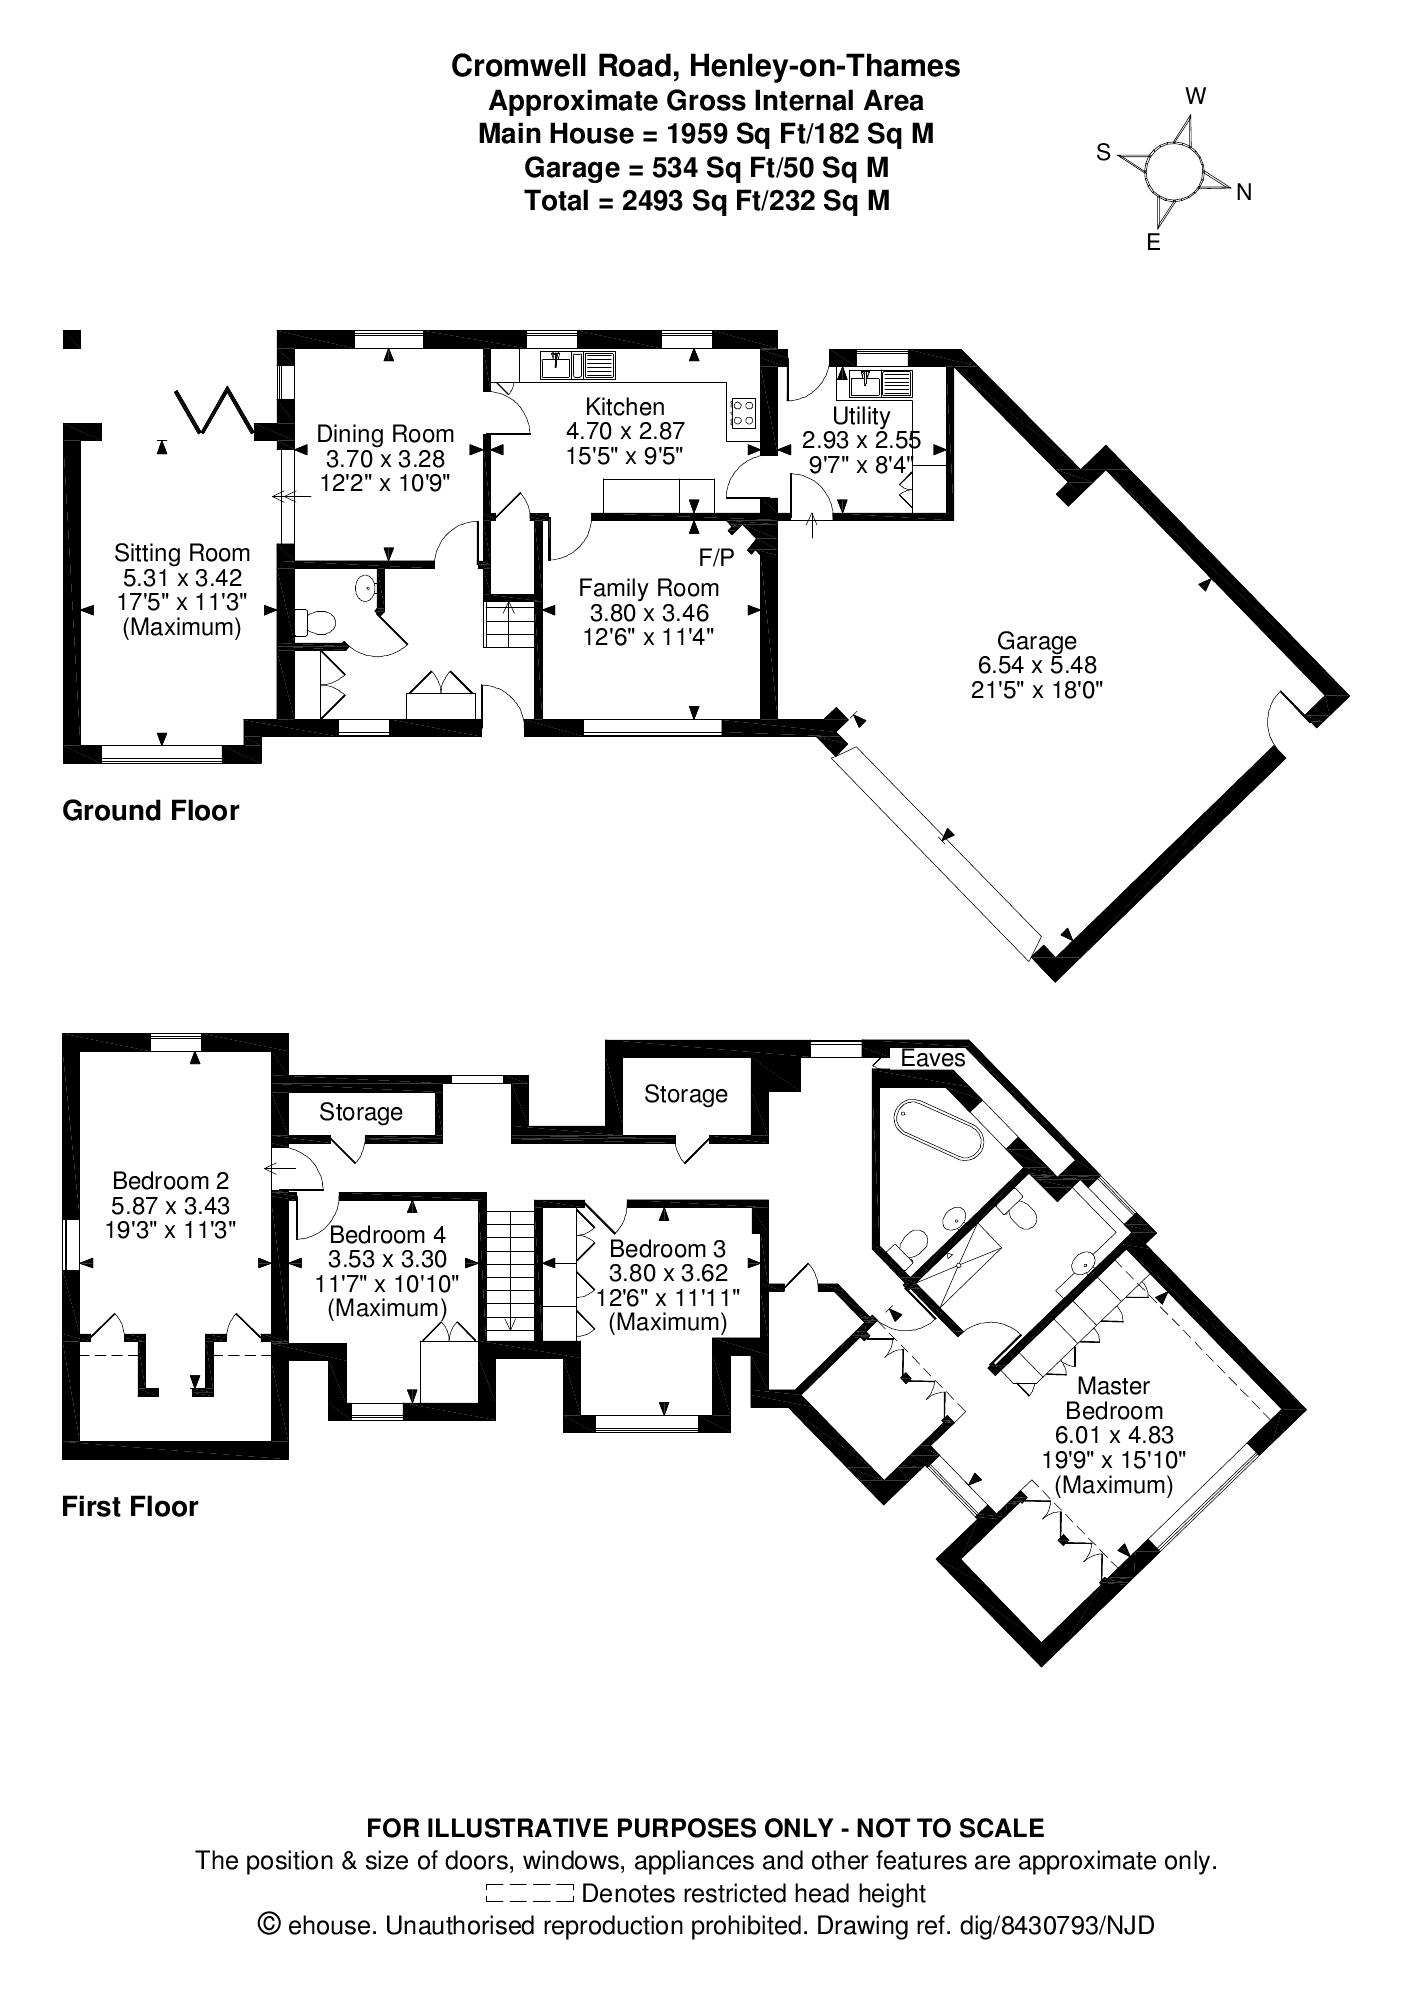 Existing Floorplan